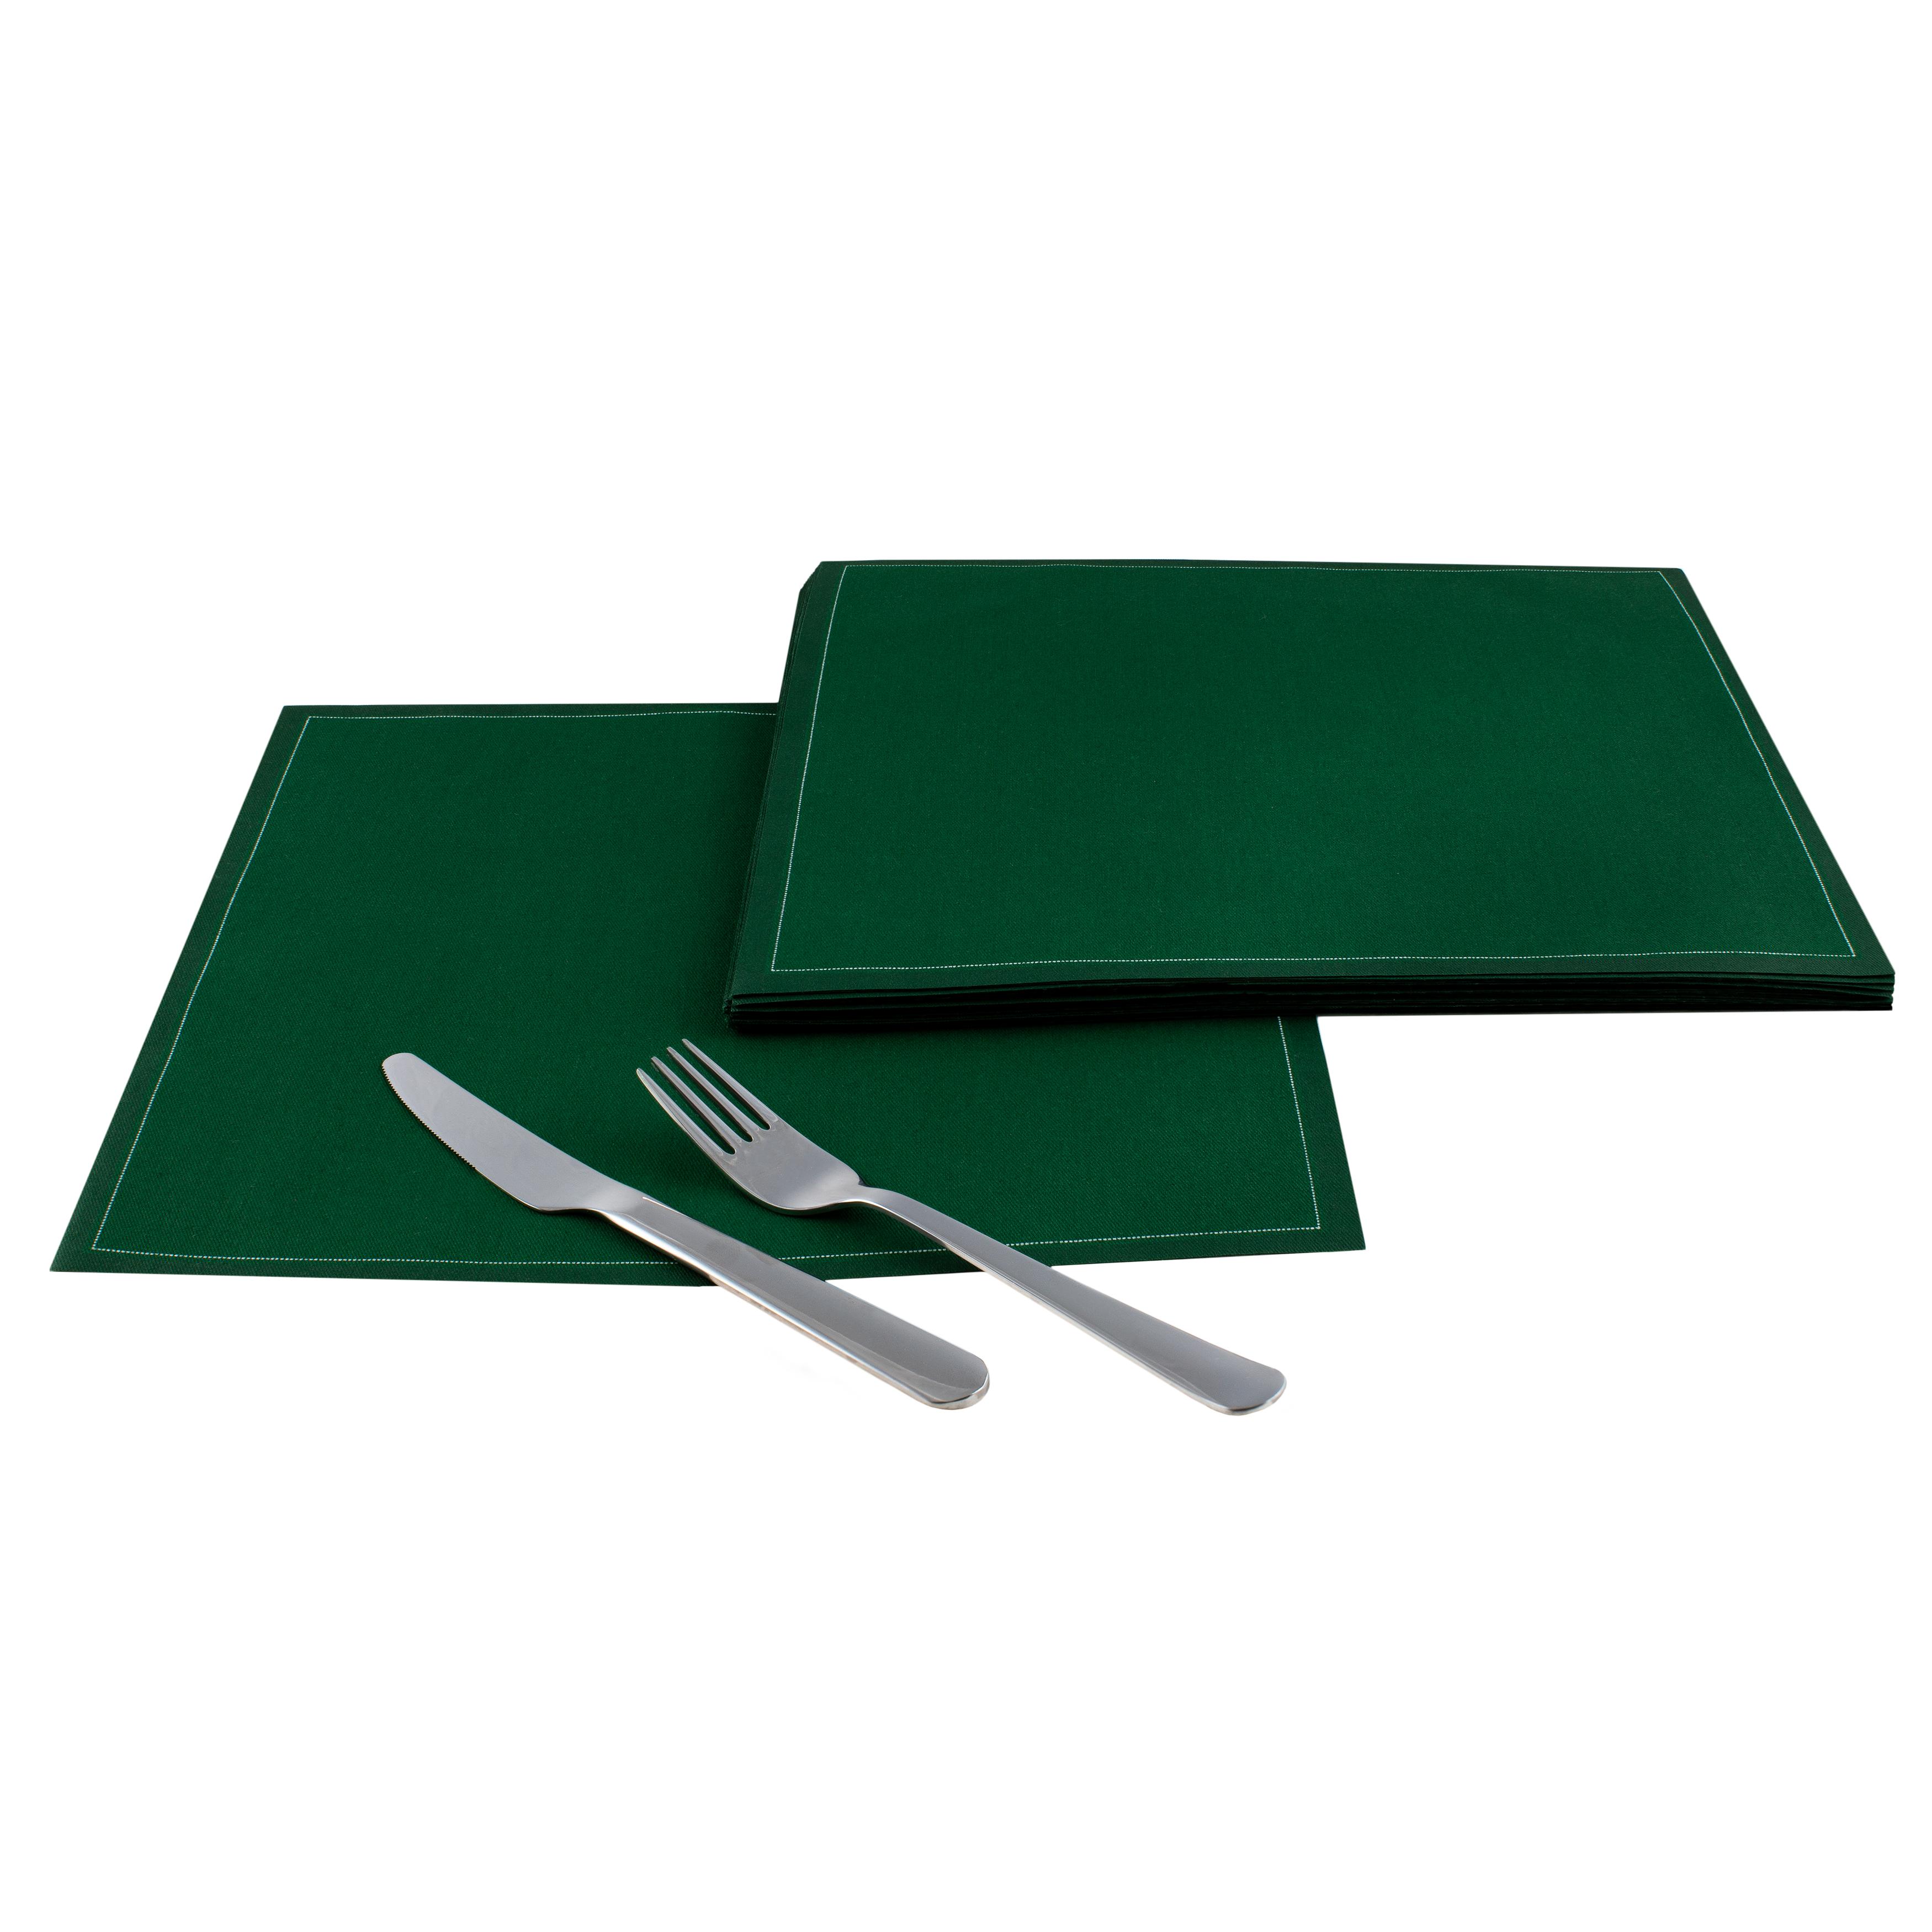 "British Racing Green Cotton Dinner Napkins - 12.6"" x 12.6"" - 25 Units"